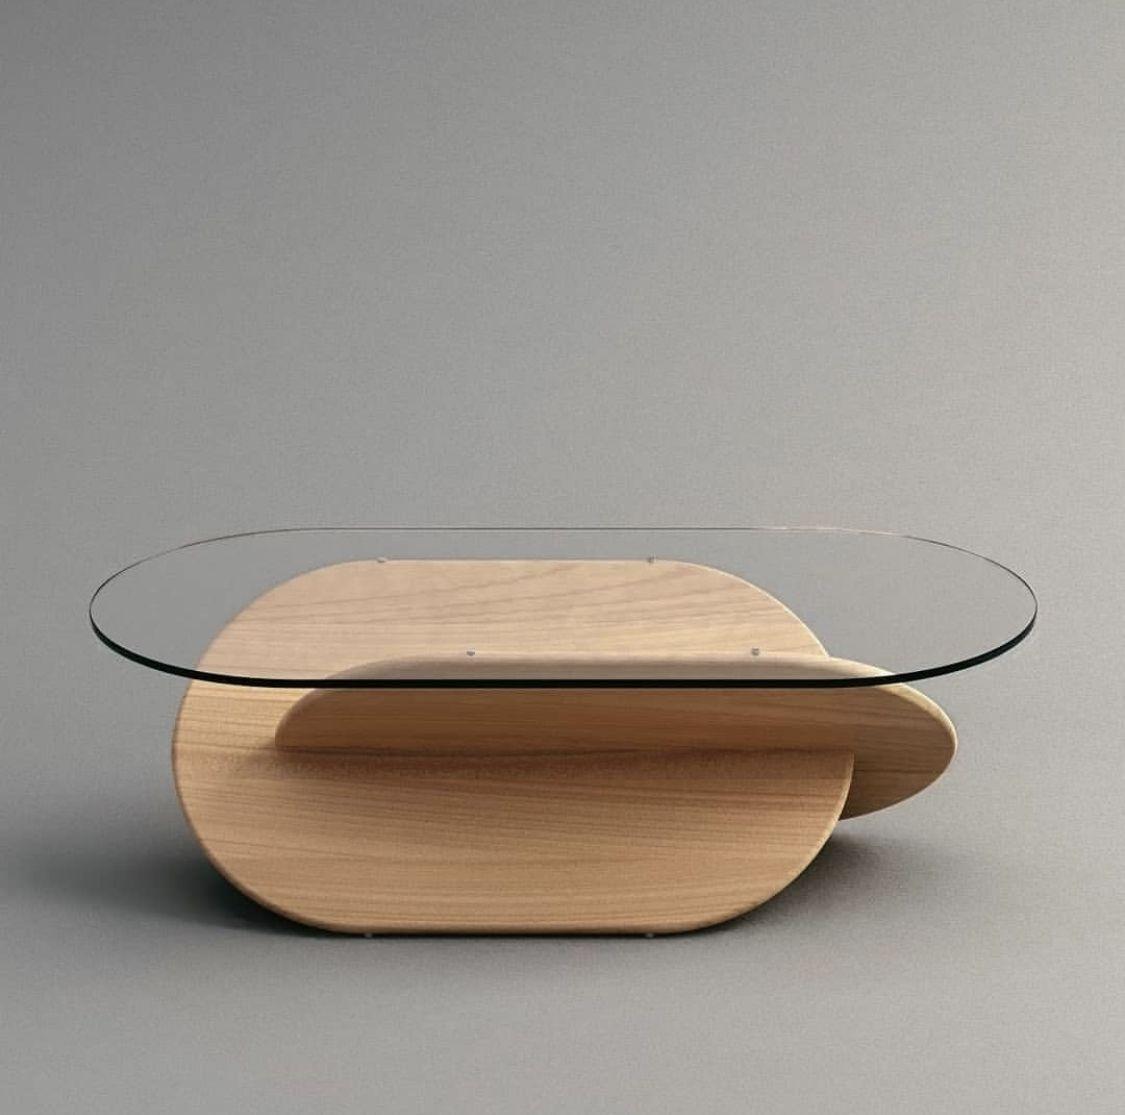 Pin De Lucio Spertino En Interiors Muebles De Madera Sala Muebles Para Departamentos Pequenos Muebles De Carpinteria [ 1115 x 1125 Pixel ]